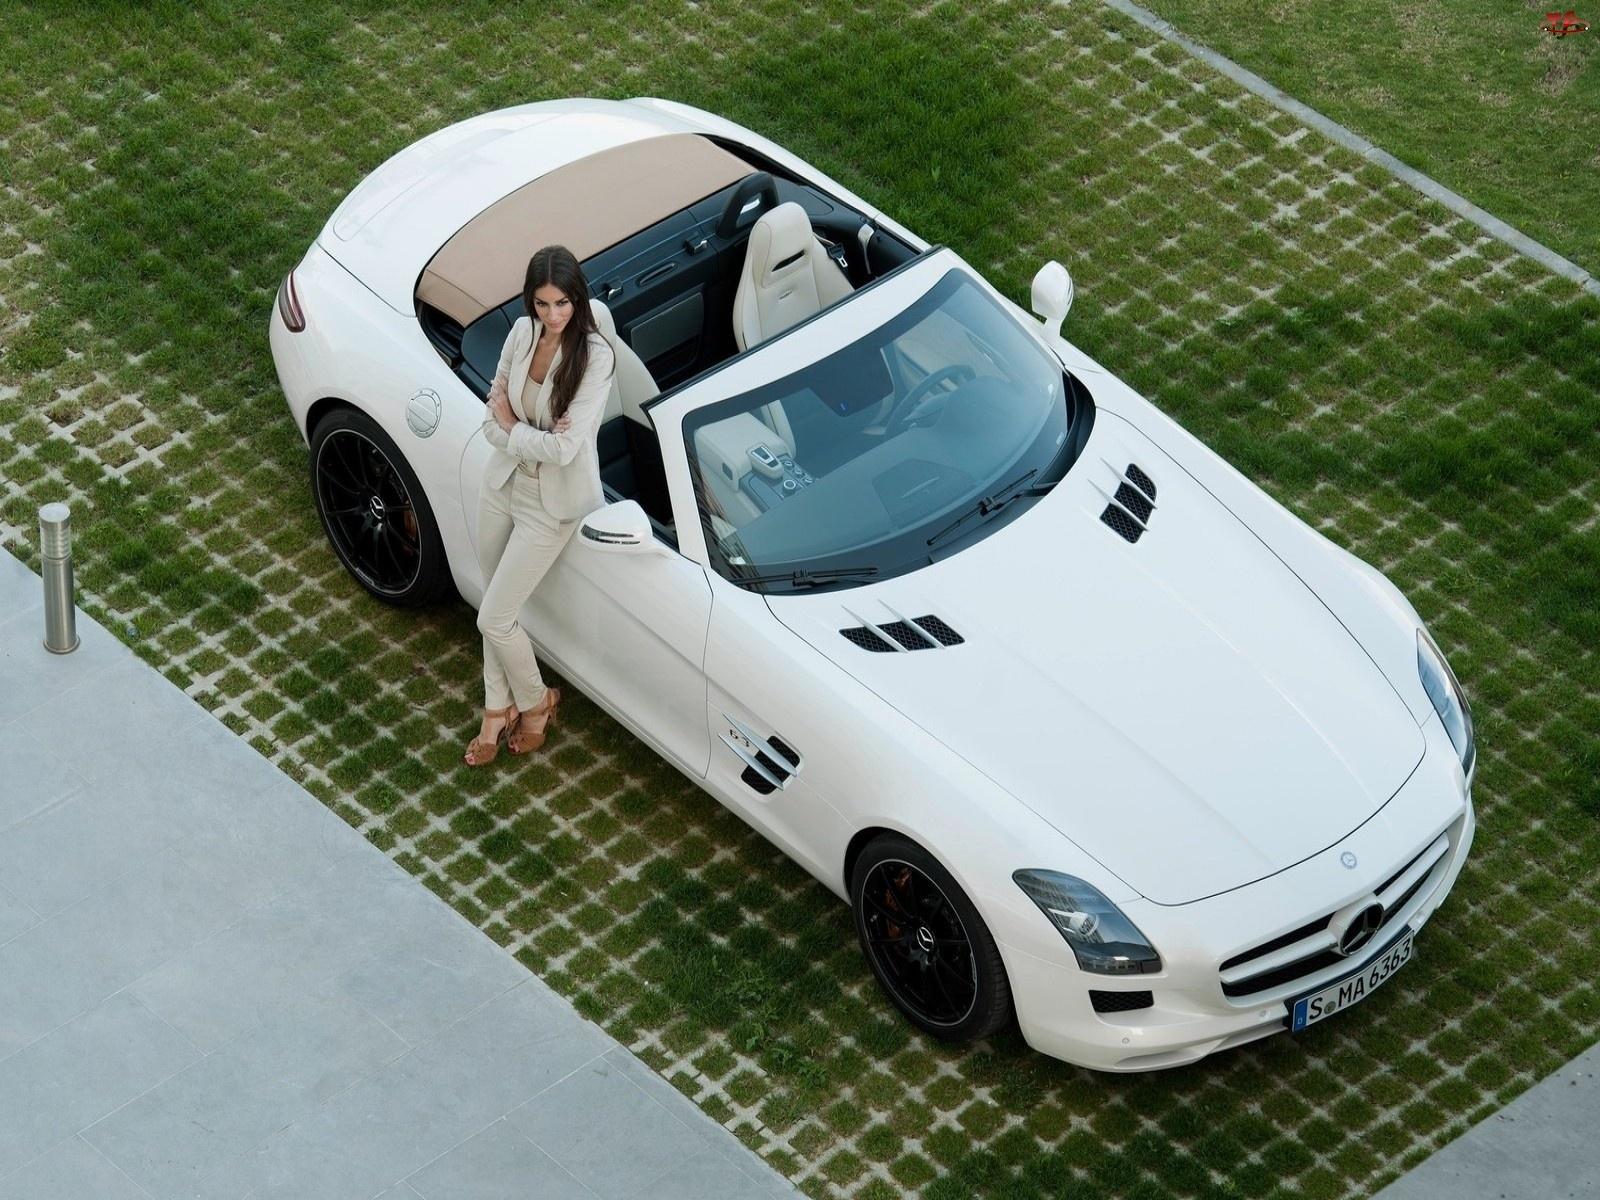 Mercedes-Benz SLS Roadster, Kobieta